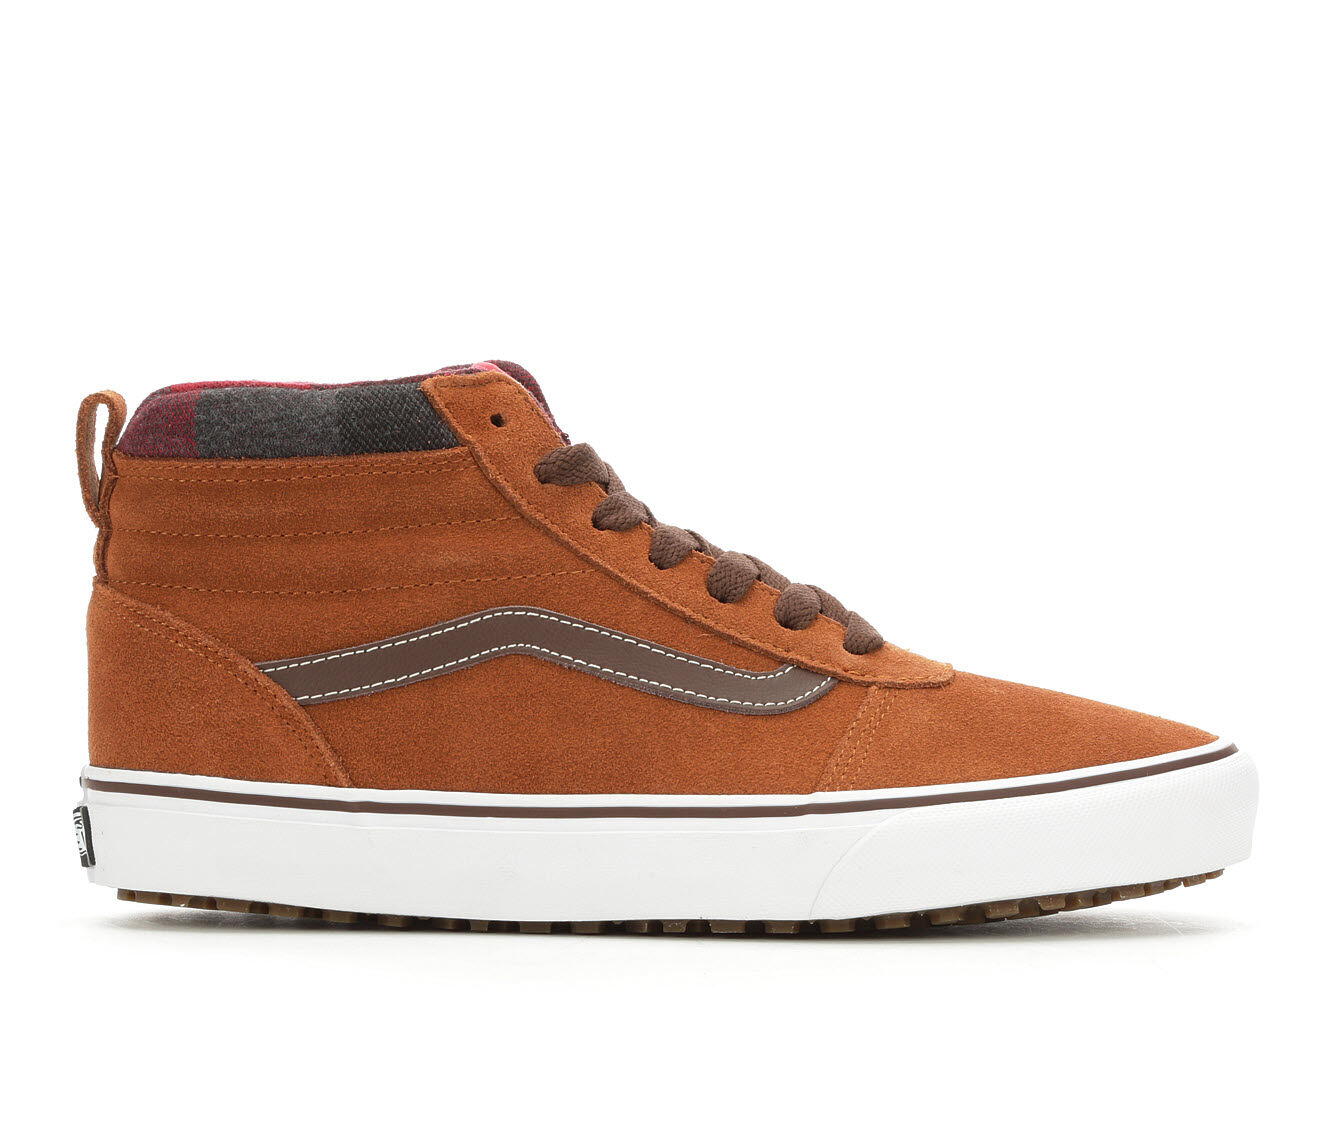 Men's Vans Ward Hi MTE Skate Shoes Brn/Wht/Plaid